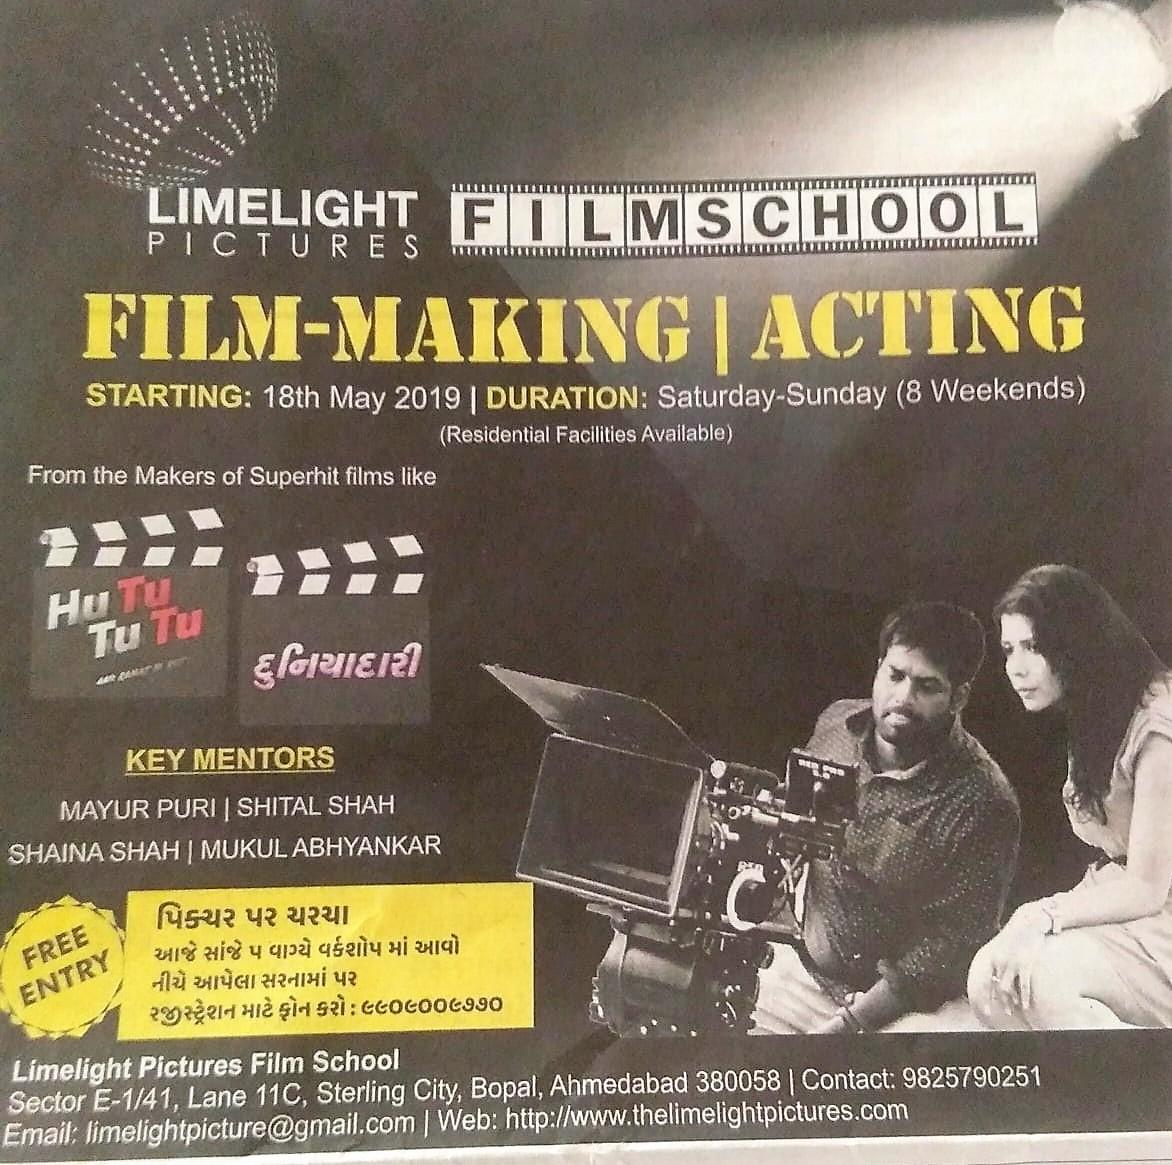 https://creativeyatra.com/wp-content/uploads/2019/05/Limelight-Pictures-Acting-and-Film-Making-Workshop.jpeg